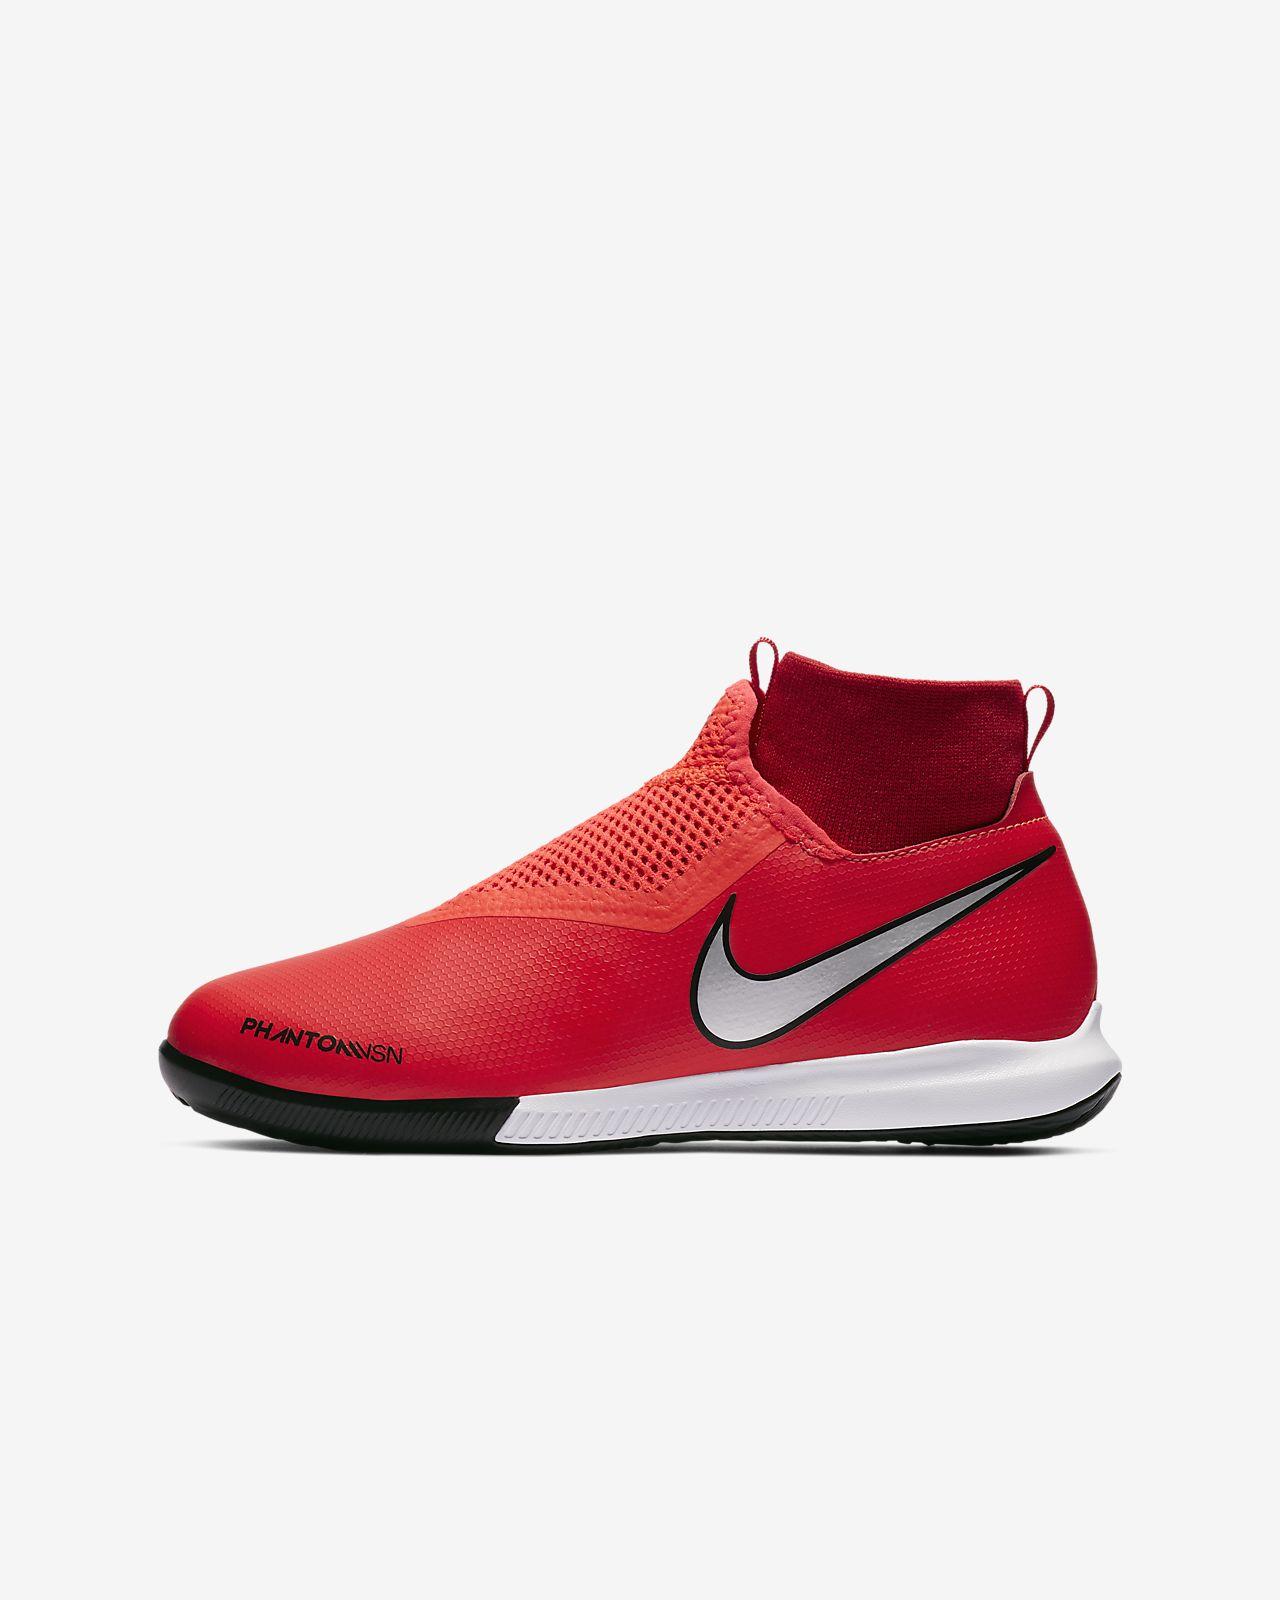 5c59749415 ... Sapatilhas de futsal Nike Jr. Phantom Vision Academy Dynamic Fit IC  para criança